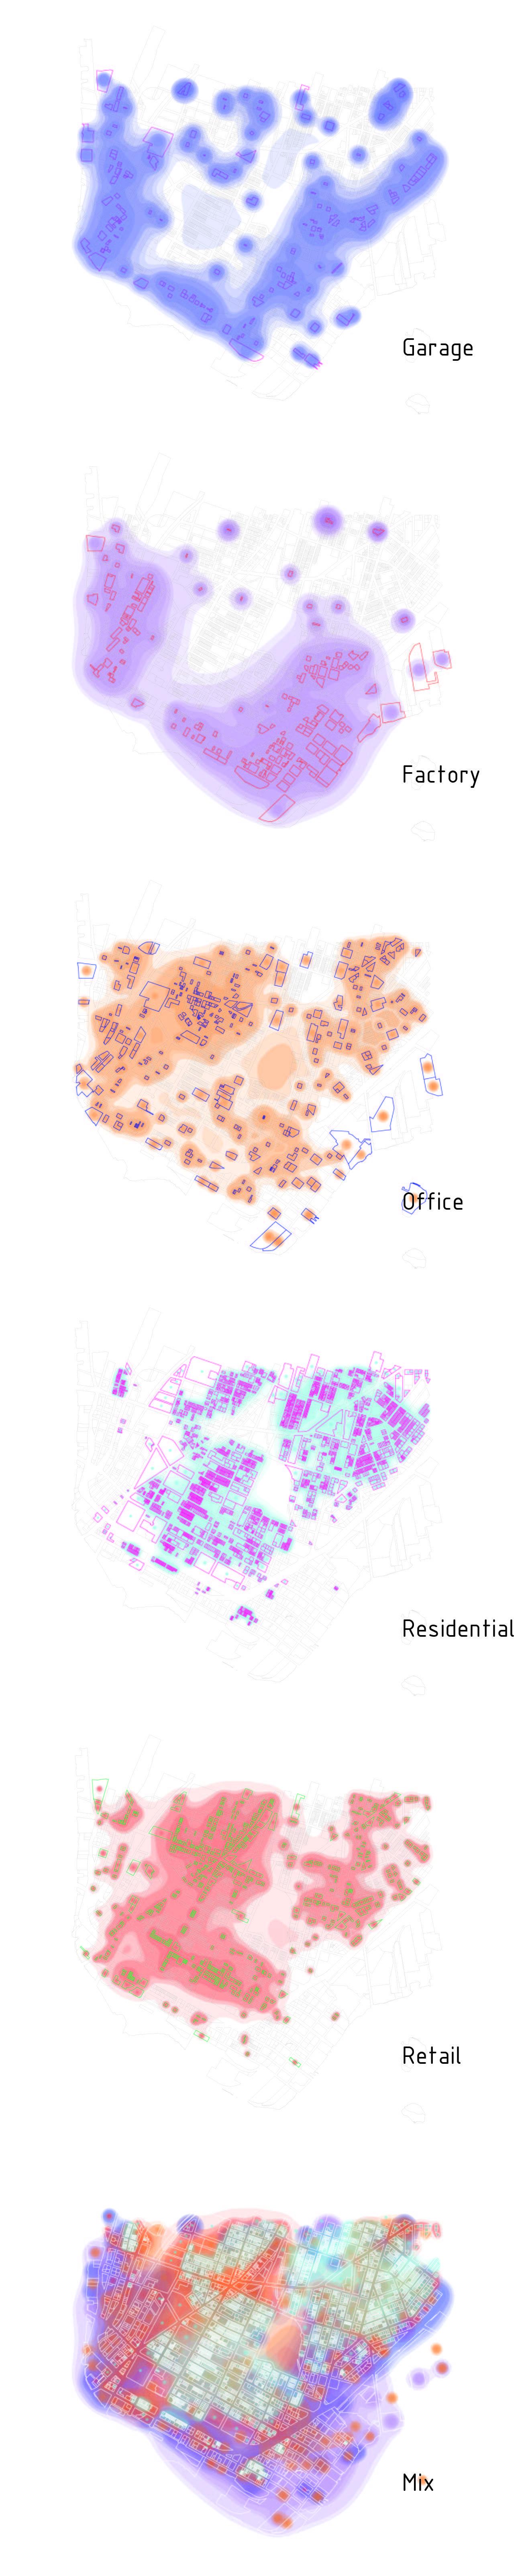 Land Use Analysis Of South Bronx    2016    Huai Kuan Chung